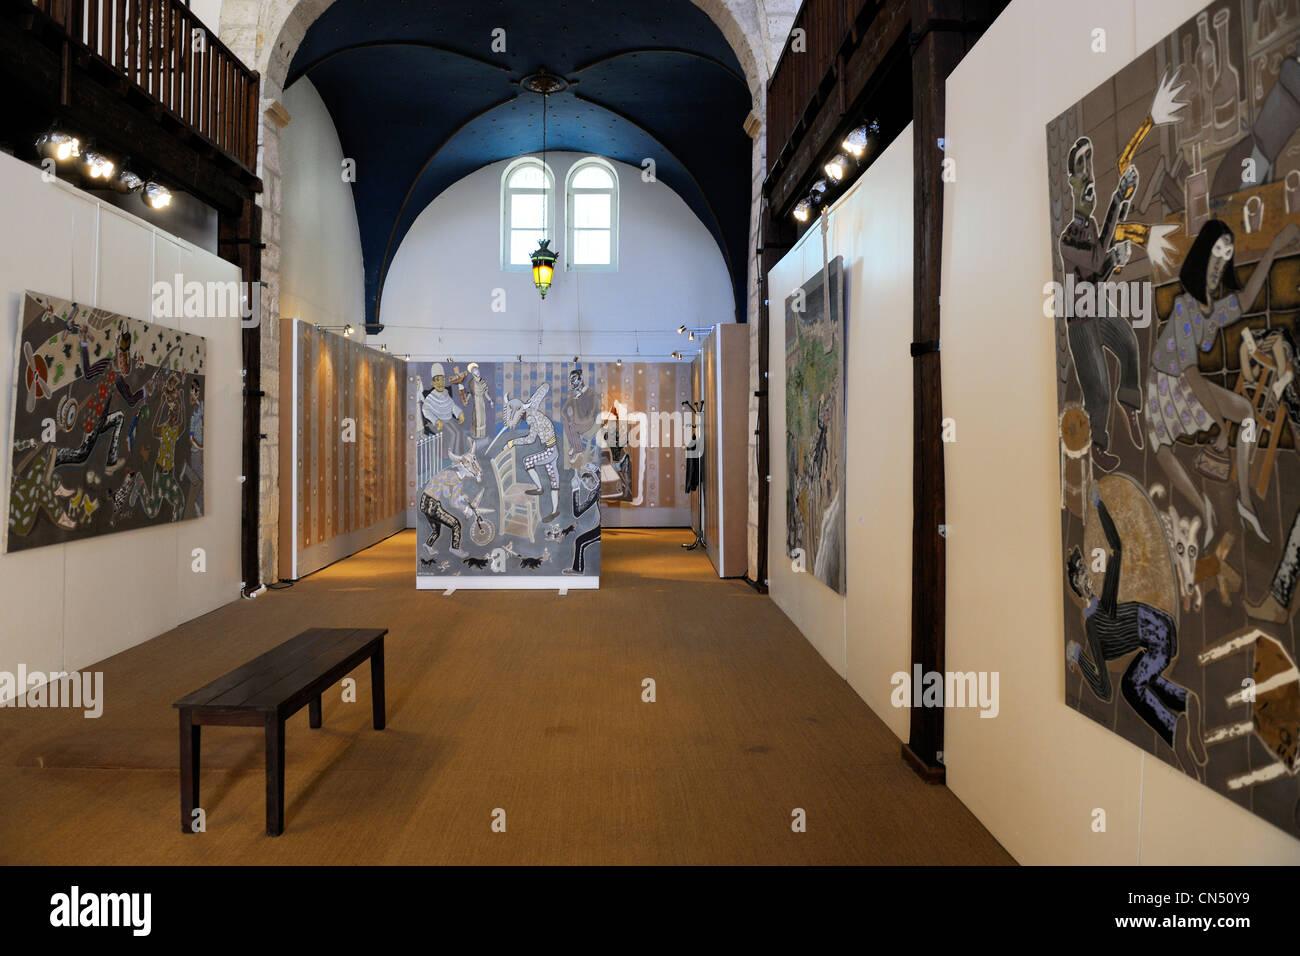 France, Herault, Sete, Frontignan Museum, exhibition from the artist Andre Cervera, Serie couleur pour roman noir - Stock Image